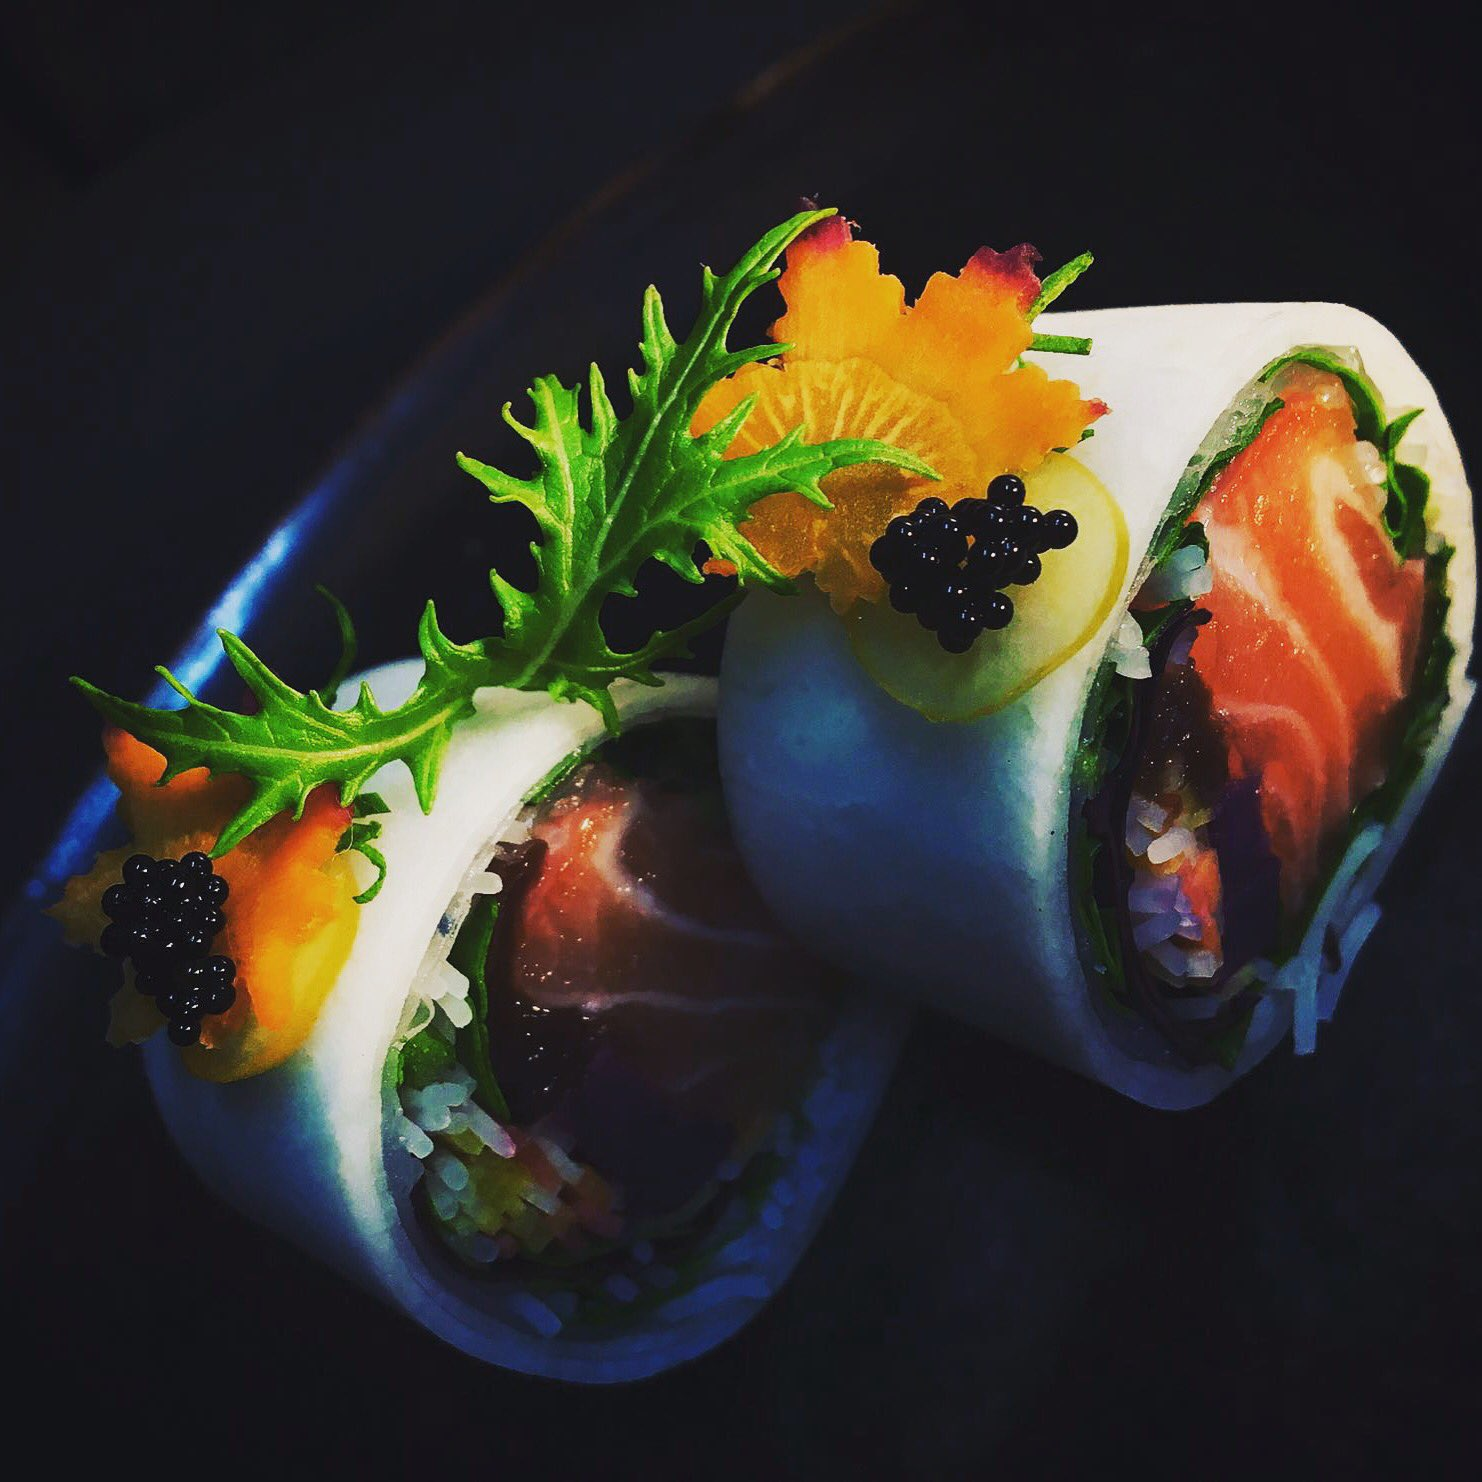 Ensalada de fideos de arroz, rúcula, zanahoria, papaya deshidratada, patata violeta y salmón envuelto en daikon. https://t.co/cYGiL3Qx3x